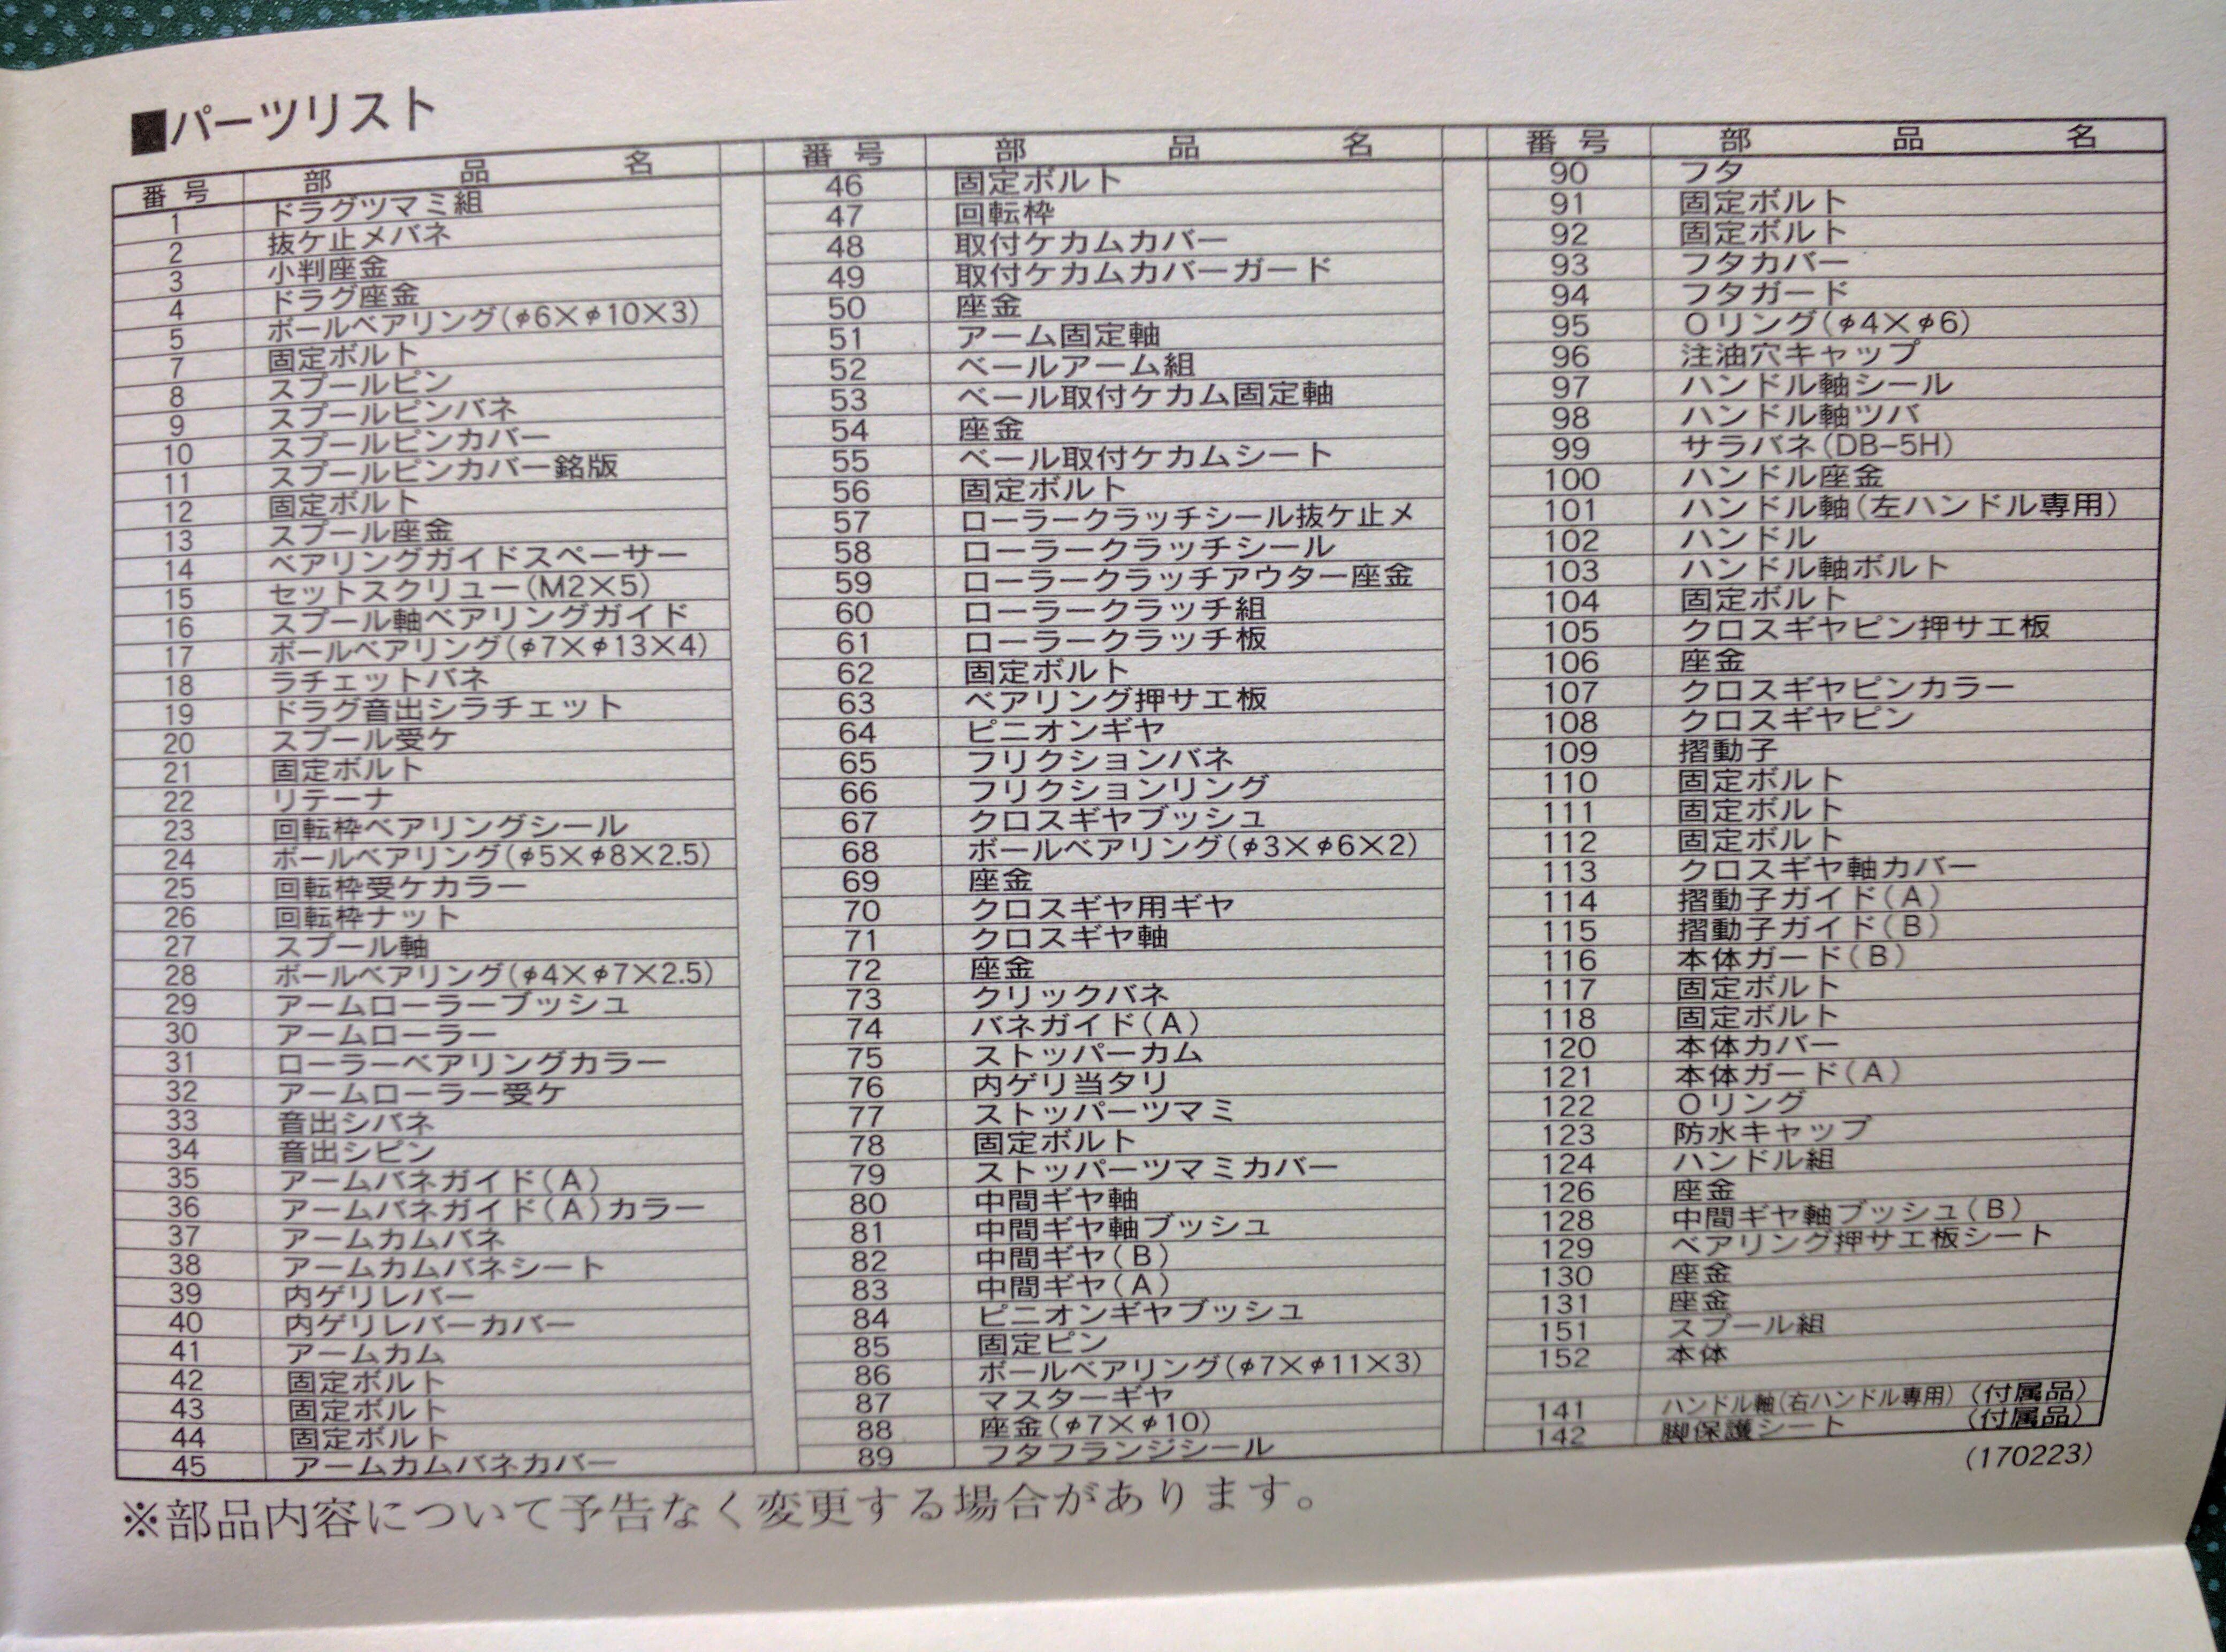 shimano-04stella-2500S-parts-list (107223)